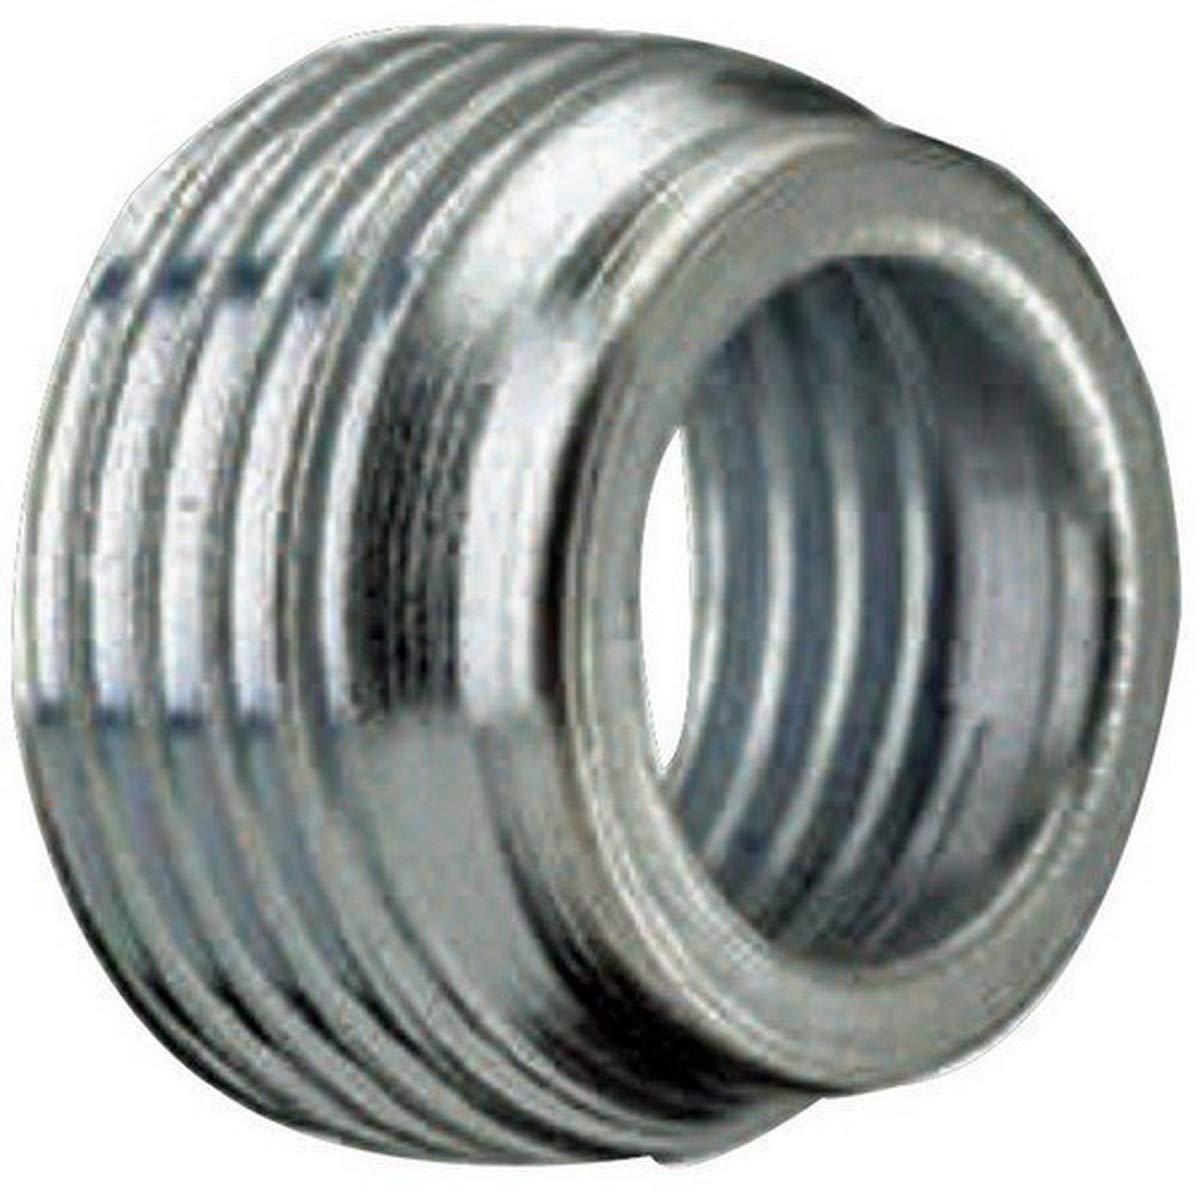 Morris Products 14669 Reducing Bushing, Steel, 1-1/2